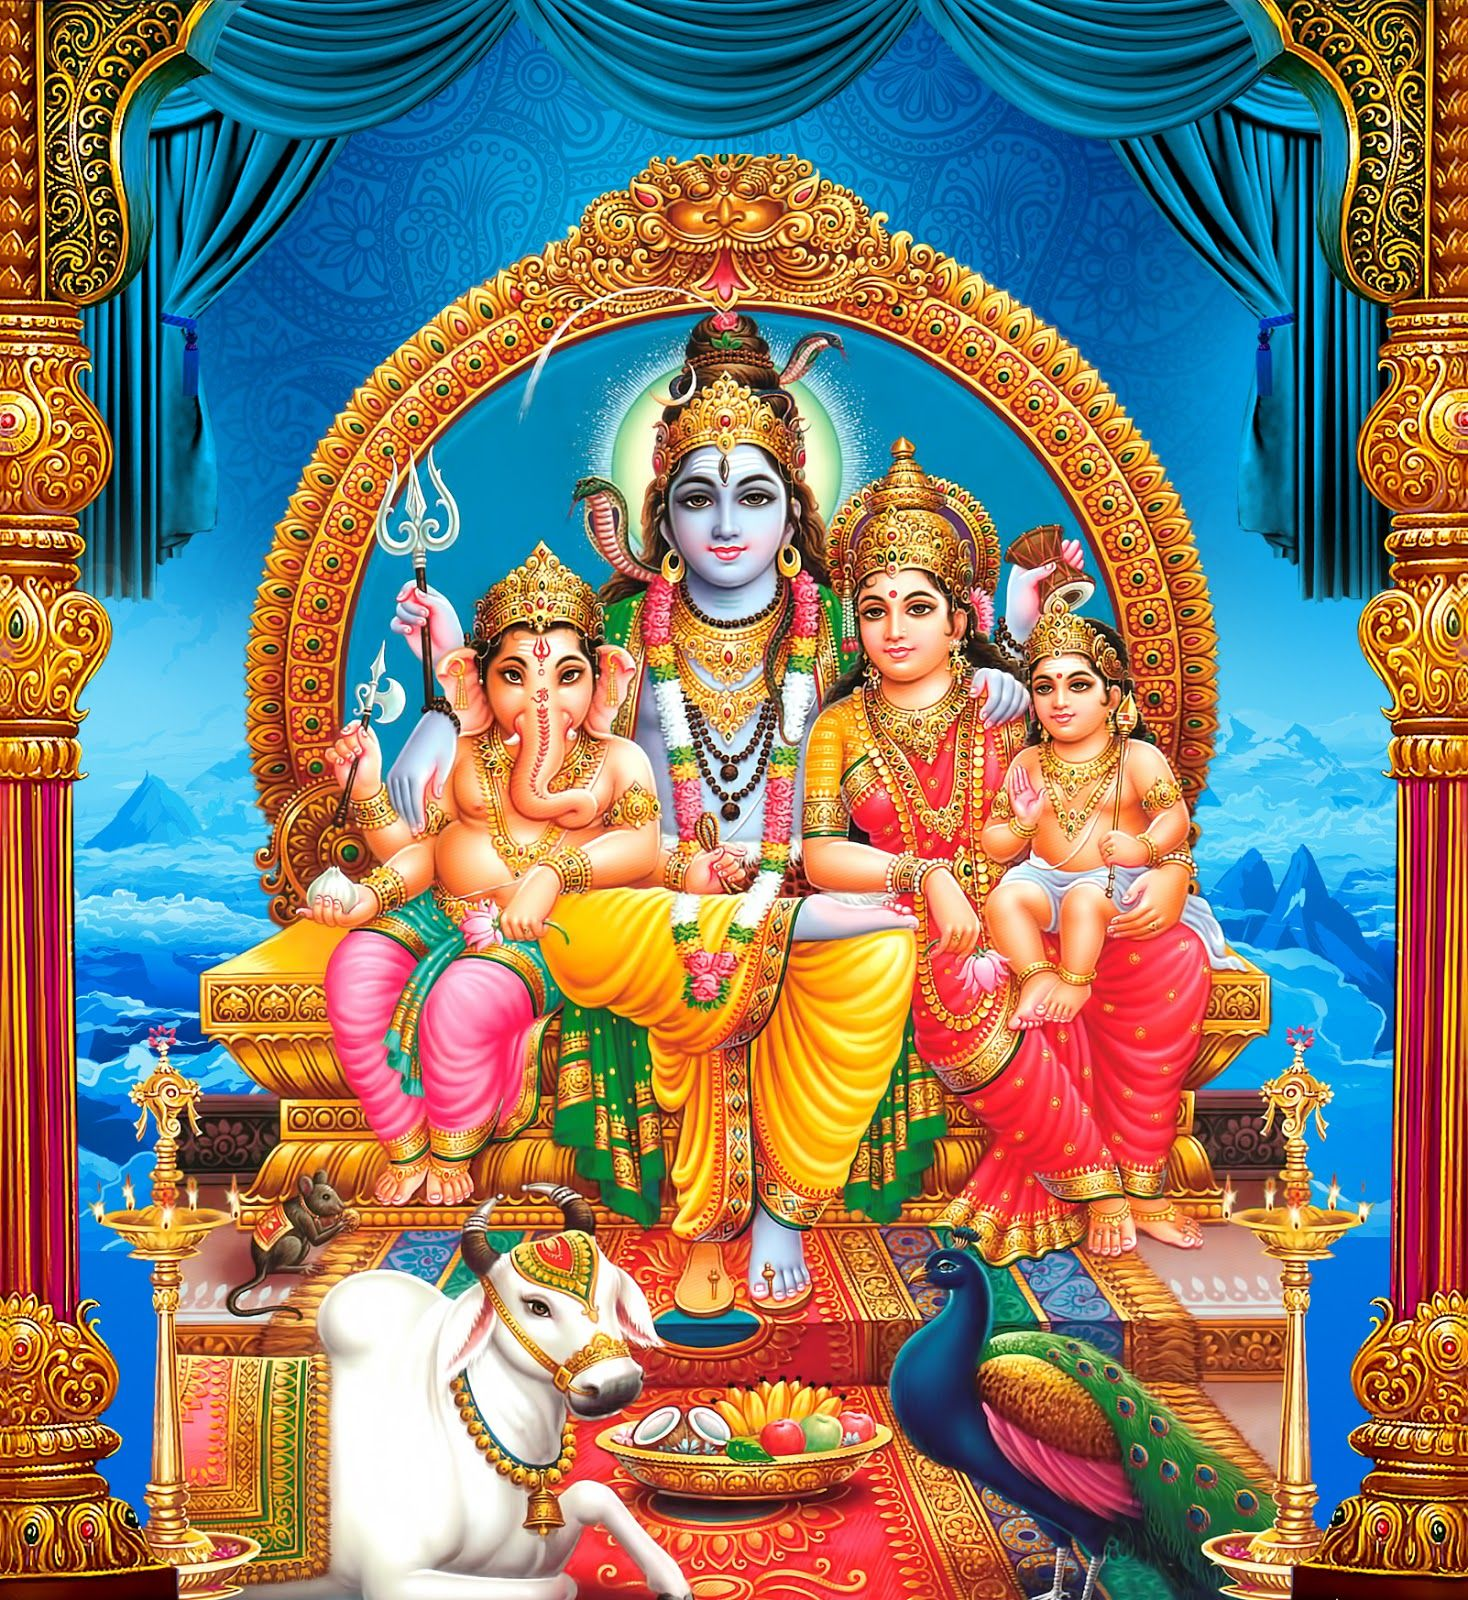 Gods Wallpaper: Lord Shiva Parvathi Ganesha Kartikeya Sitting Hd Wallpaper